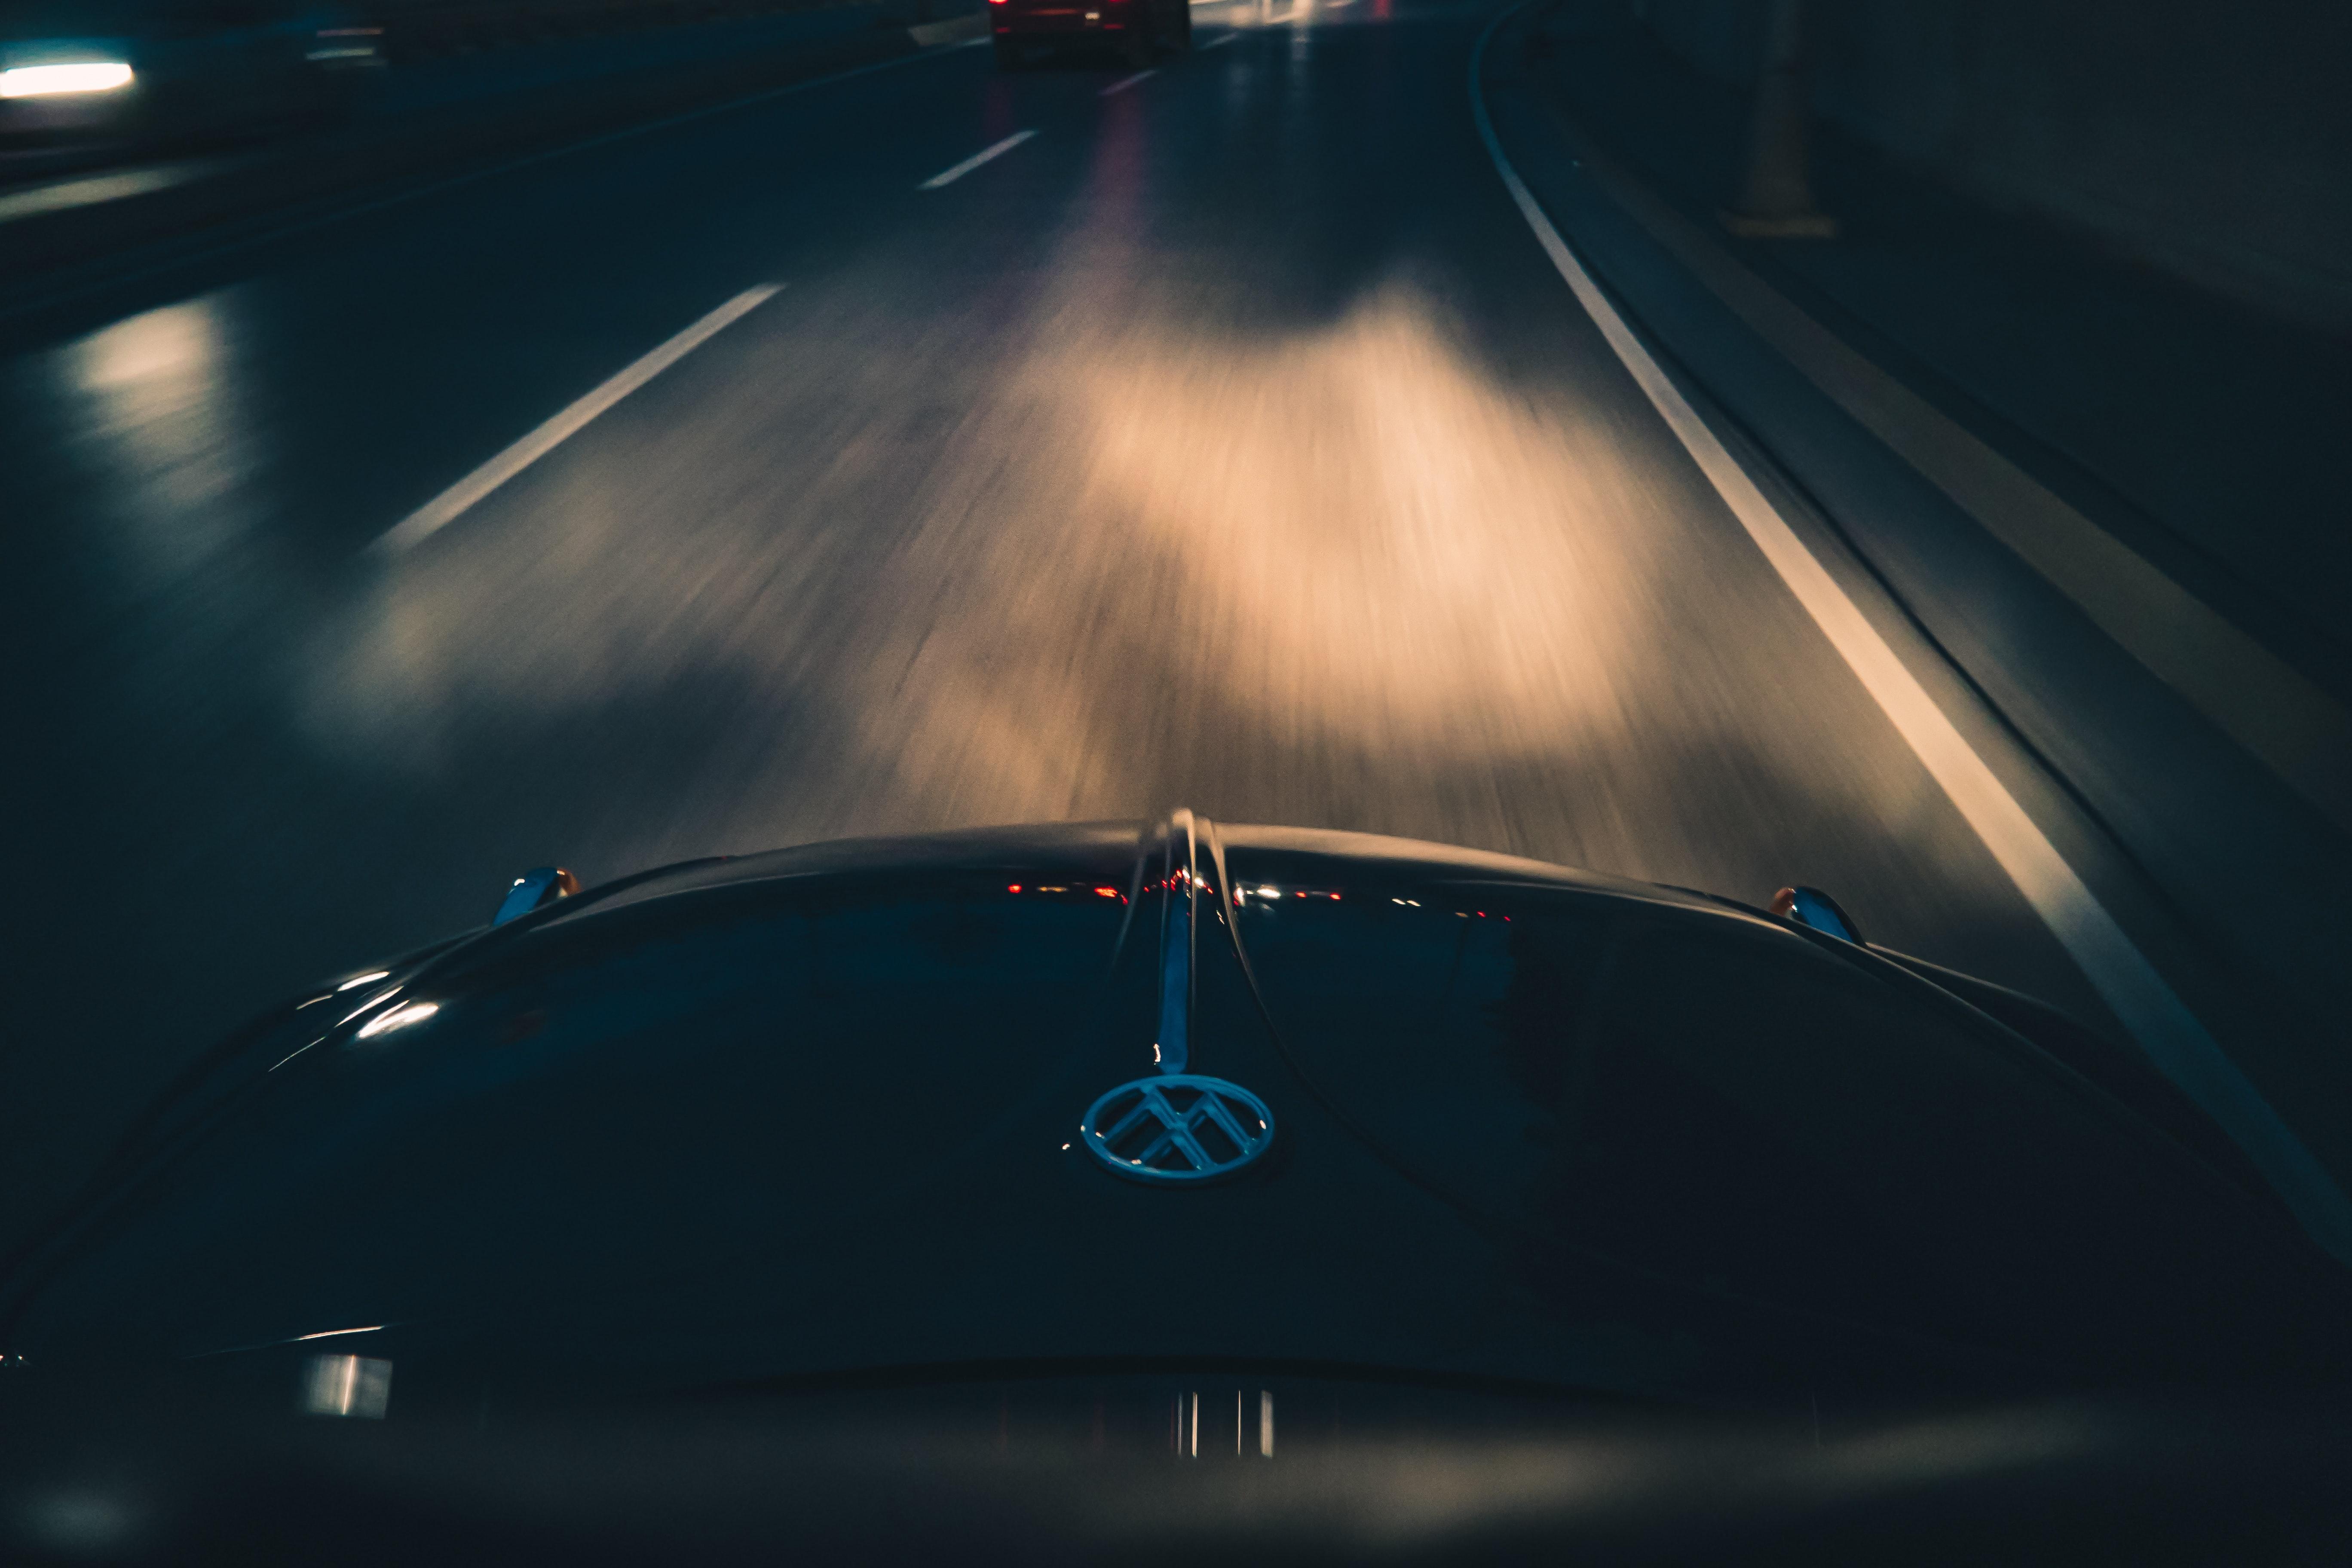 Black Volkswagen Car on Gray Asphalt Road, Asphalt, Long exposure, Vehicle, Travel, HQ Photo